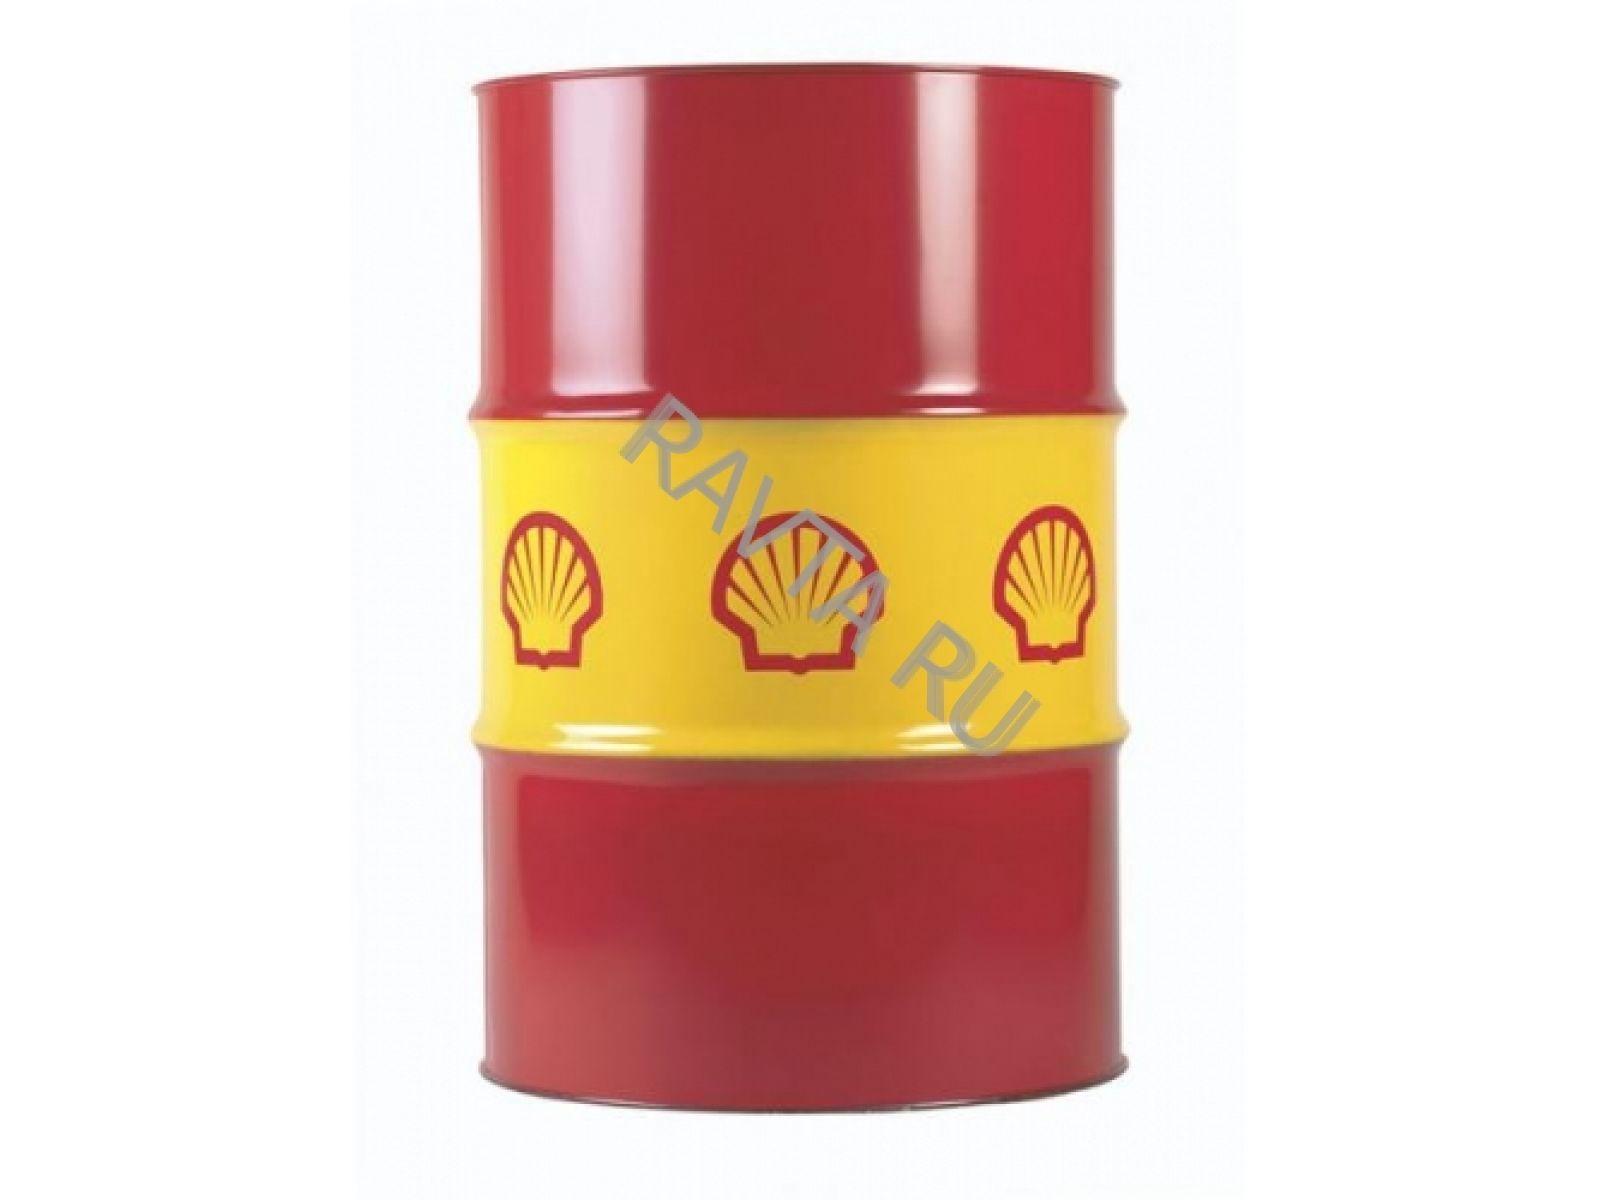 Смазка Shell Gadus S2 V220 AC2 (180 кг) от Ravta